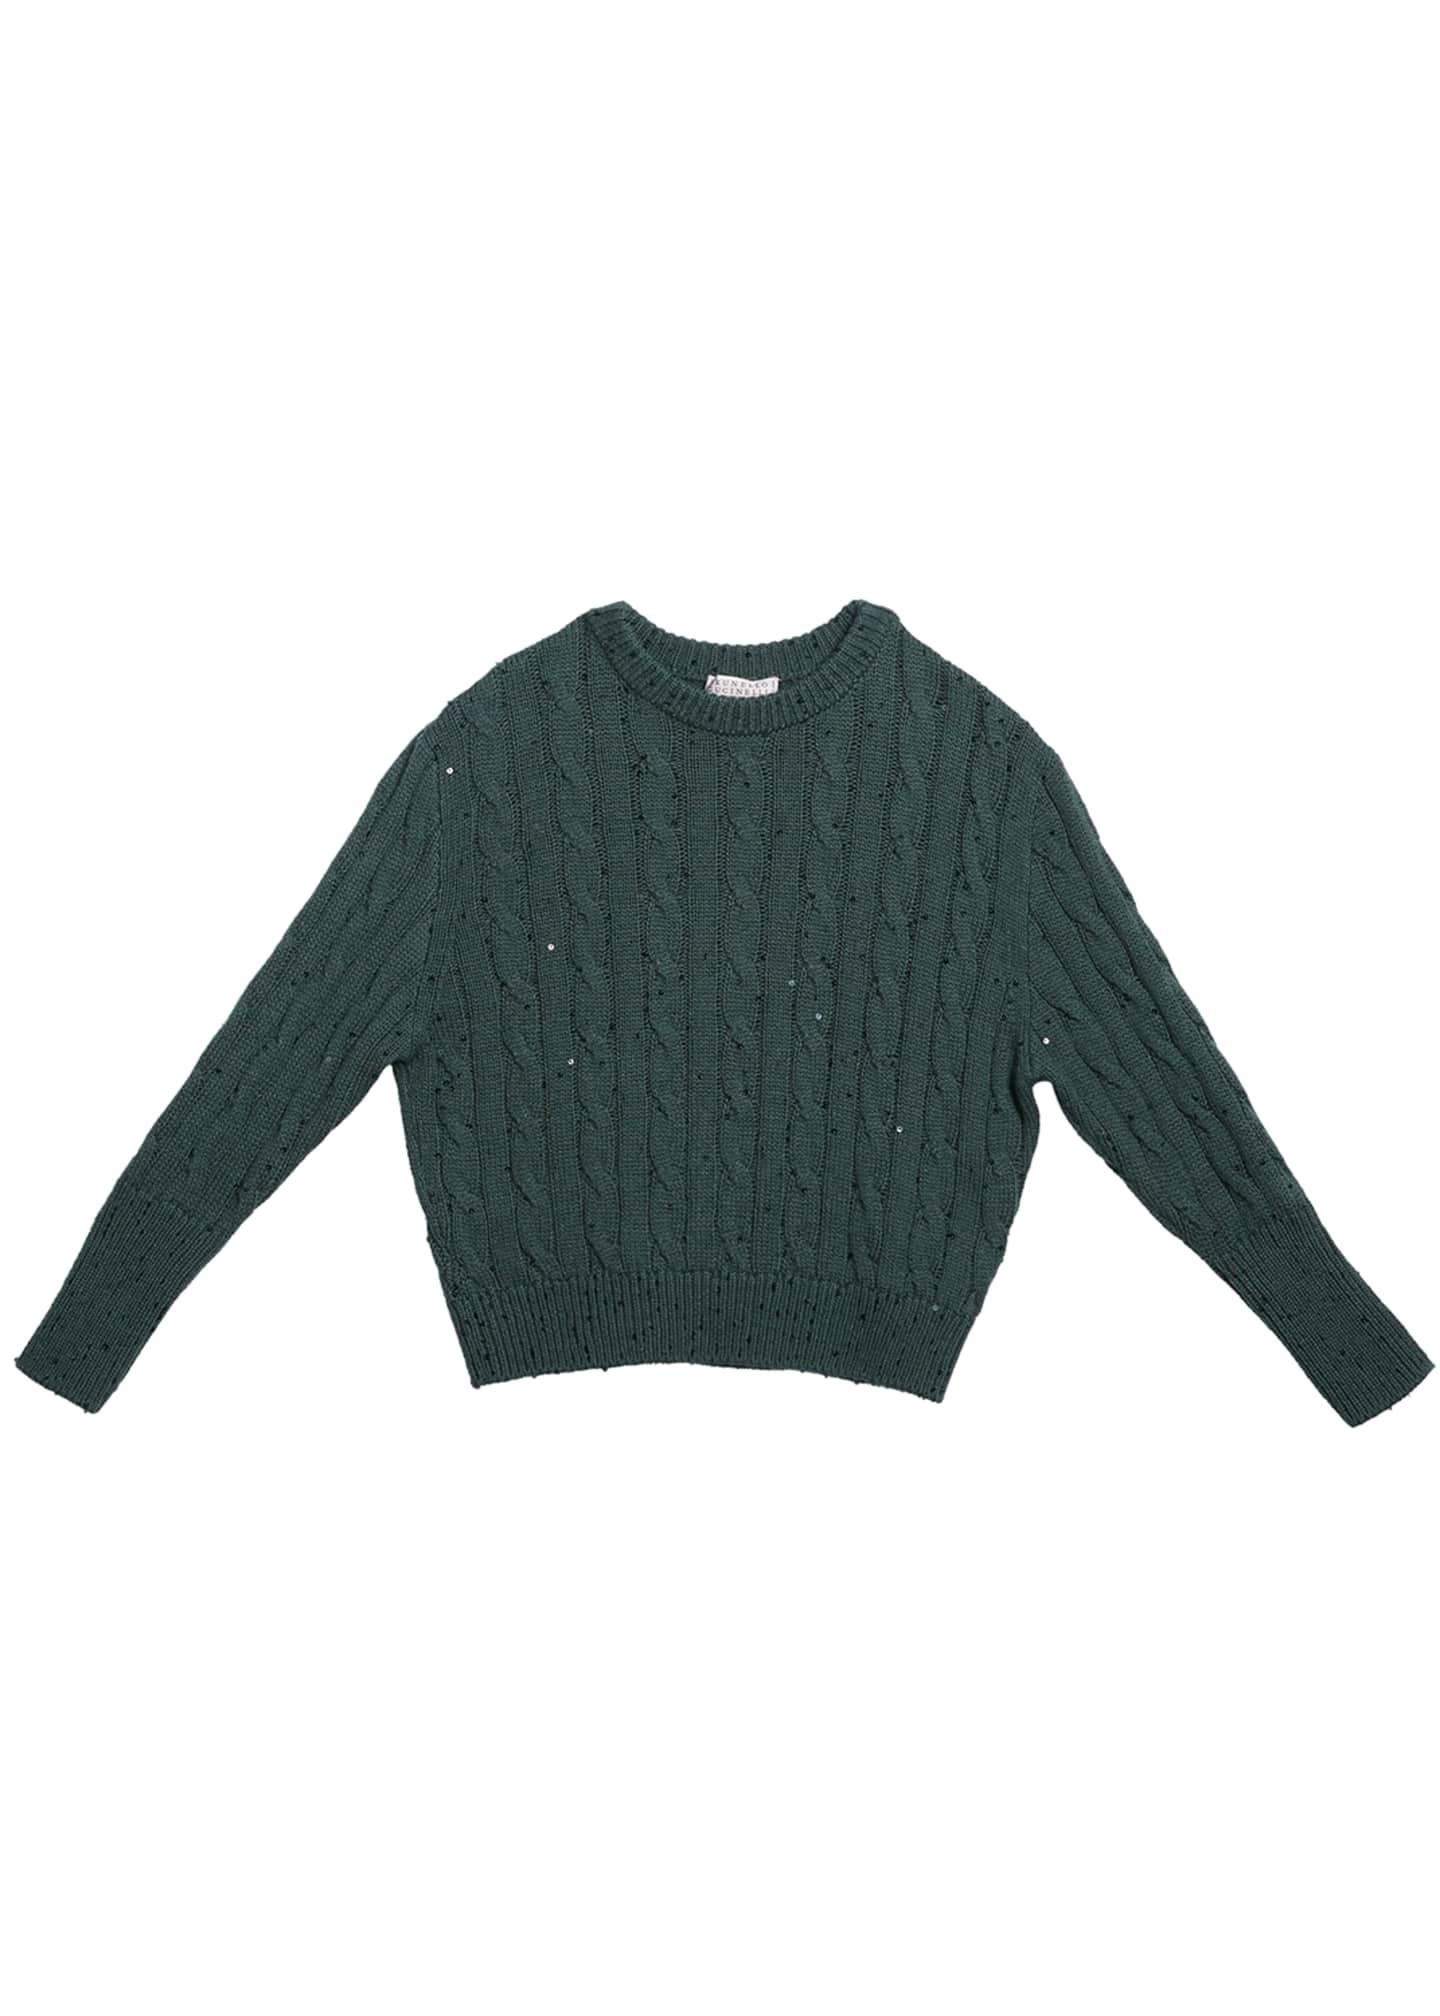 Brunello Cucinelli Girl's Cashmere Cable Knit Sweater w/